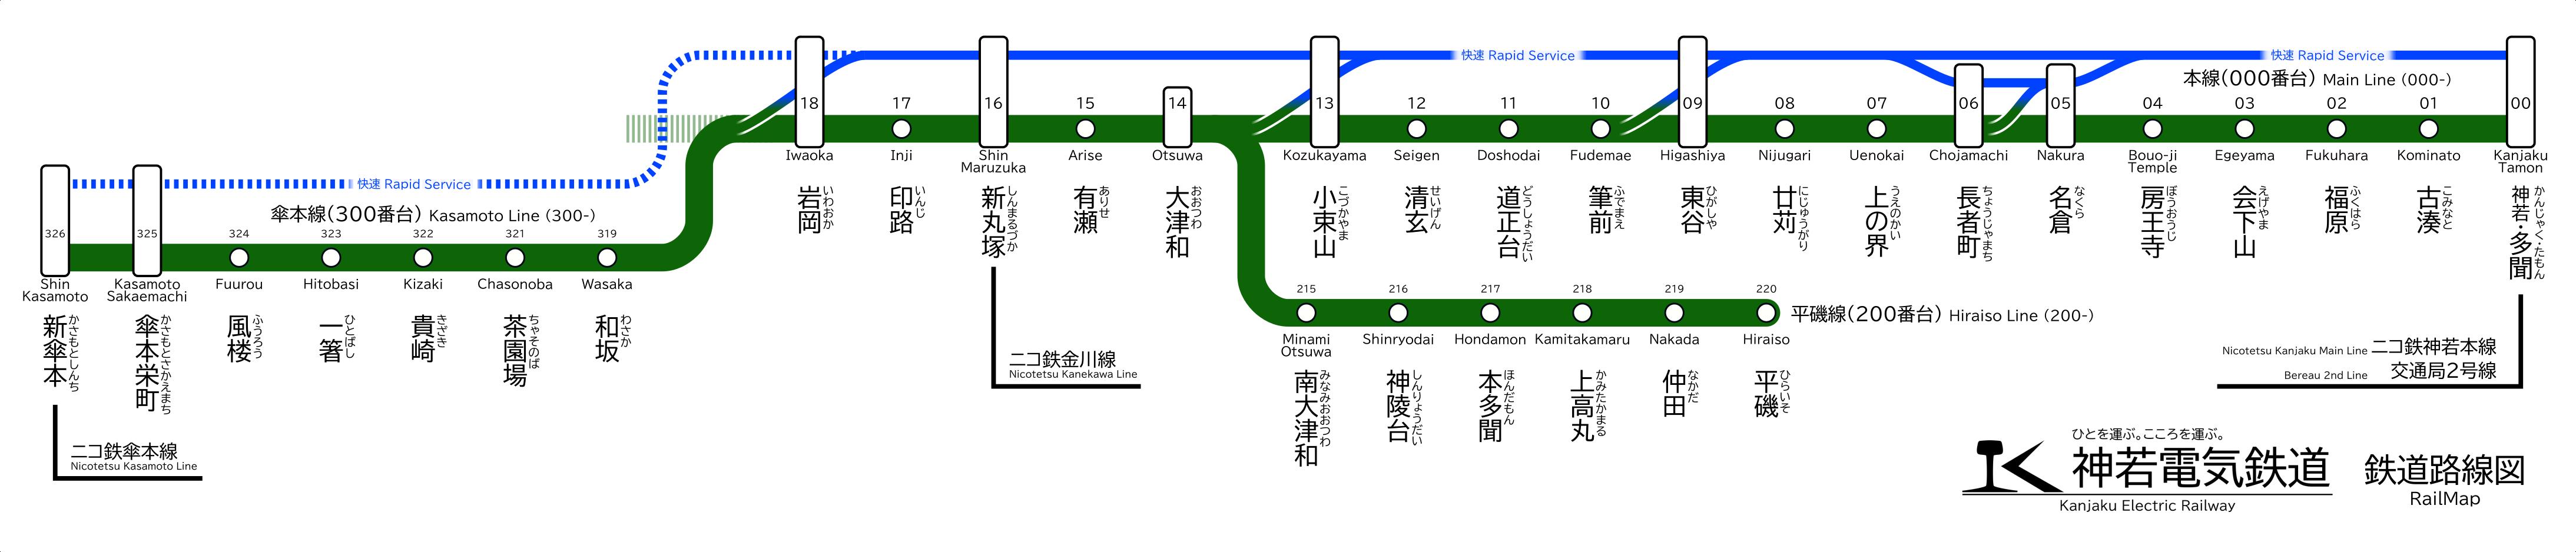 神電路線図05.png